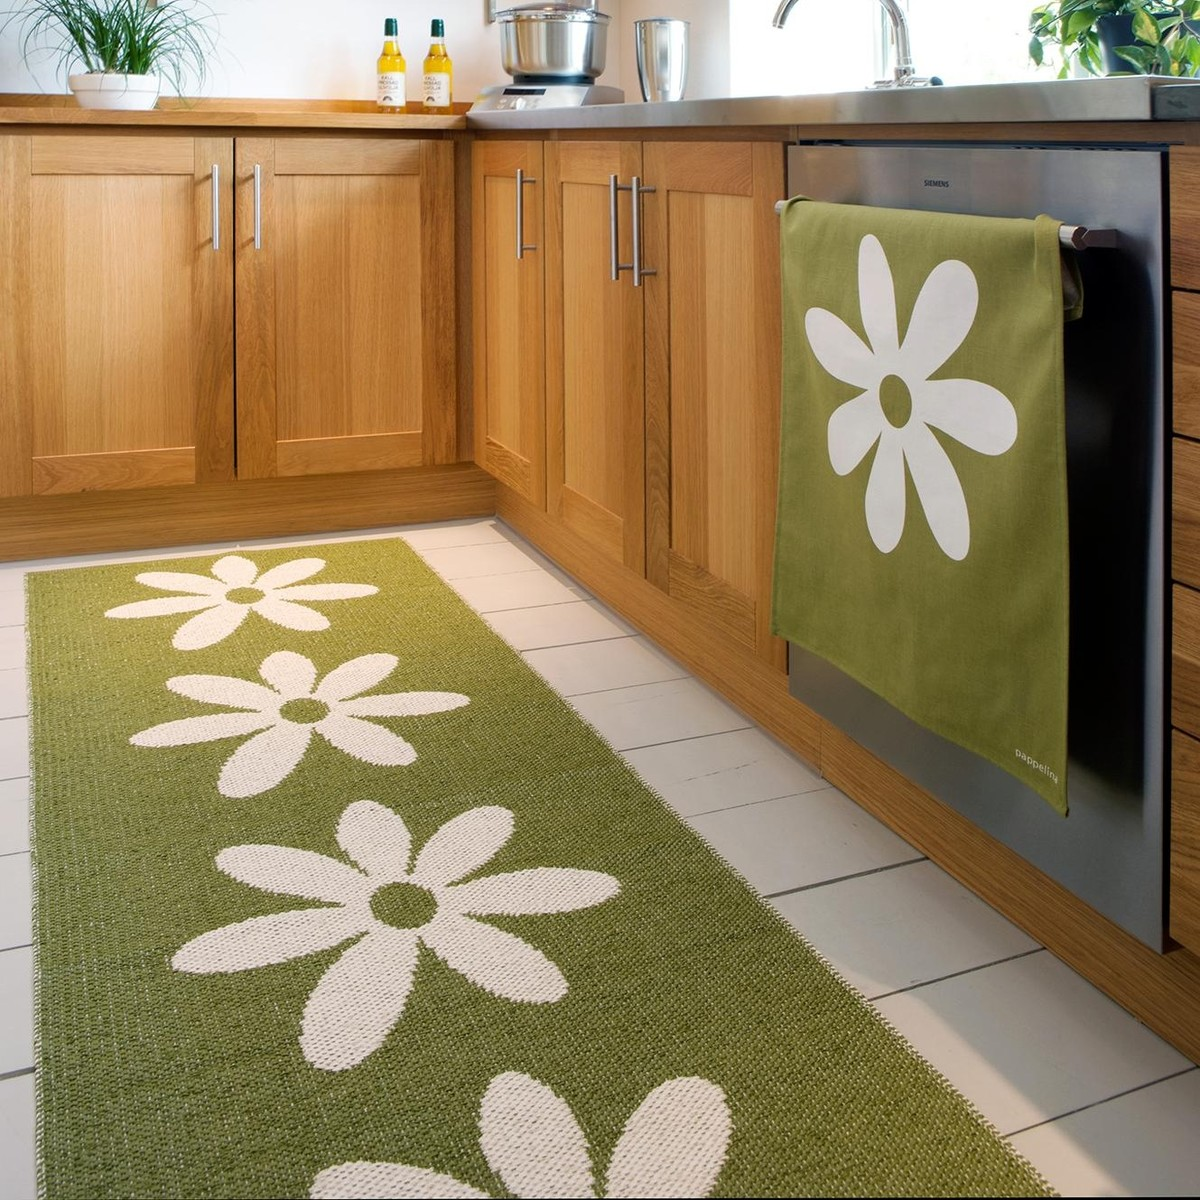 lilo plastic rug 70x250cm pappelina outdoor rugs outdoor. Black Bedroom Furniture Sets. Home Design Ideas